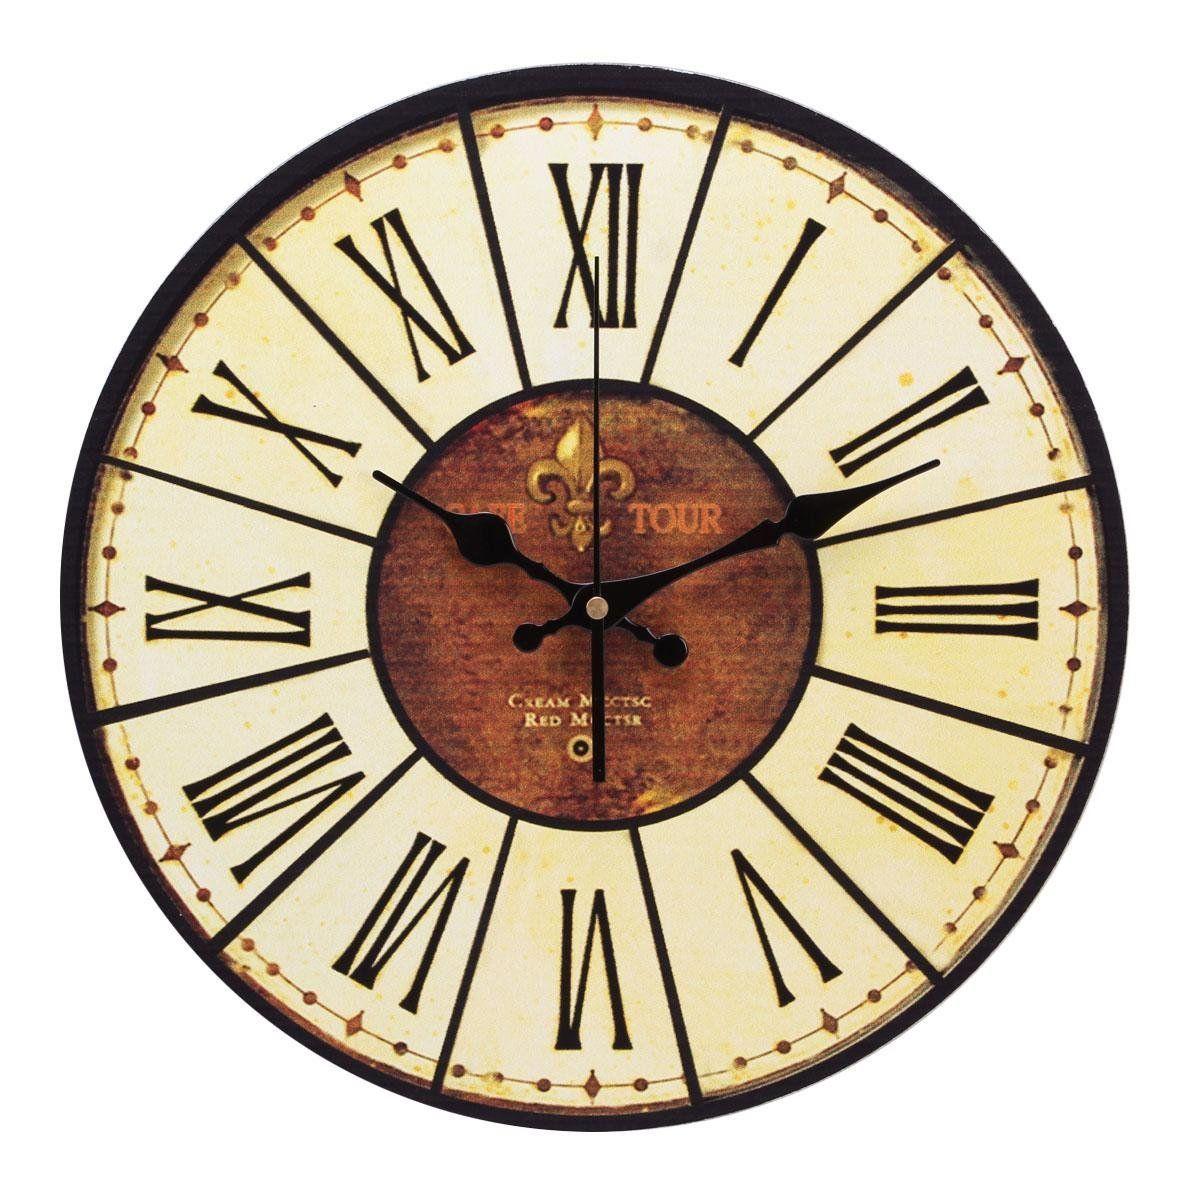 Yesurprise pendule murale en bois mdf rond horloge diy - Cuisine romaine antique ...